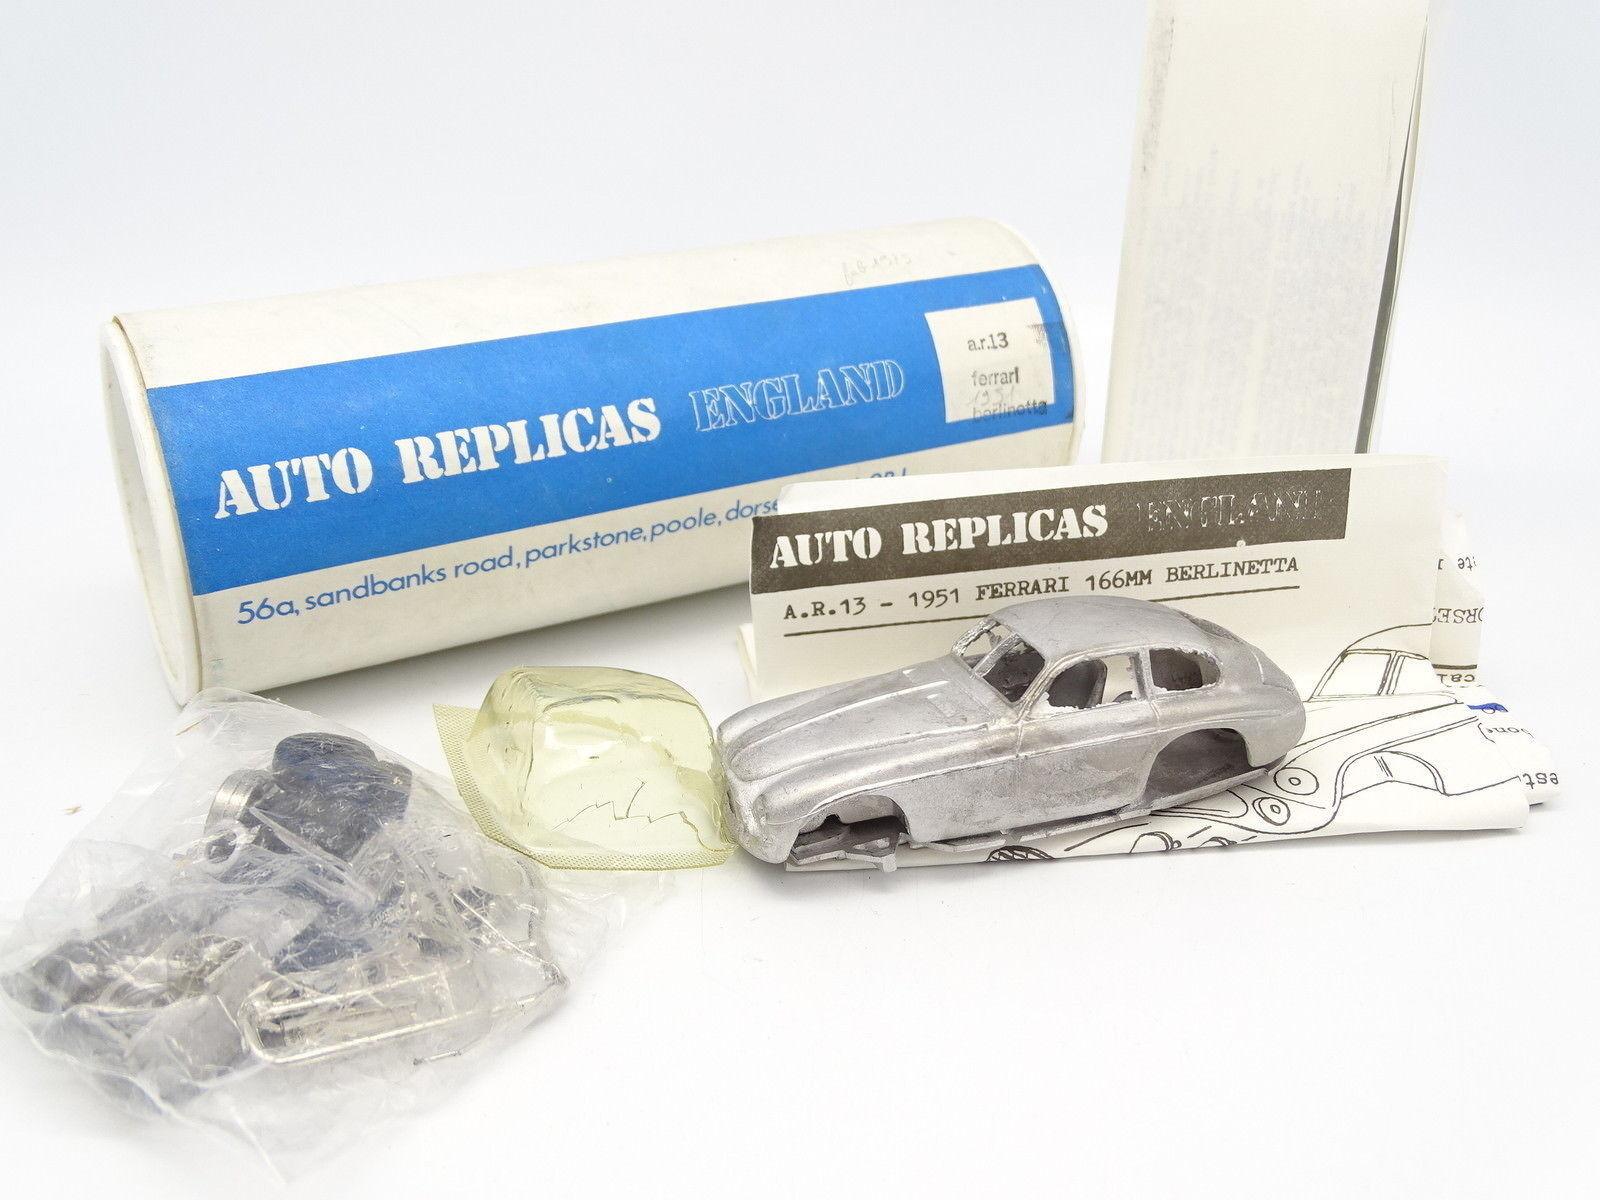 Auto - repliken set zum zusammenbauen 1   43 - ferrari 166 mm 1951